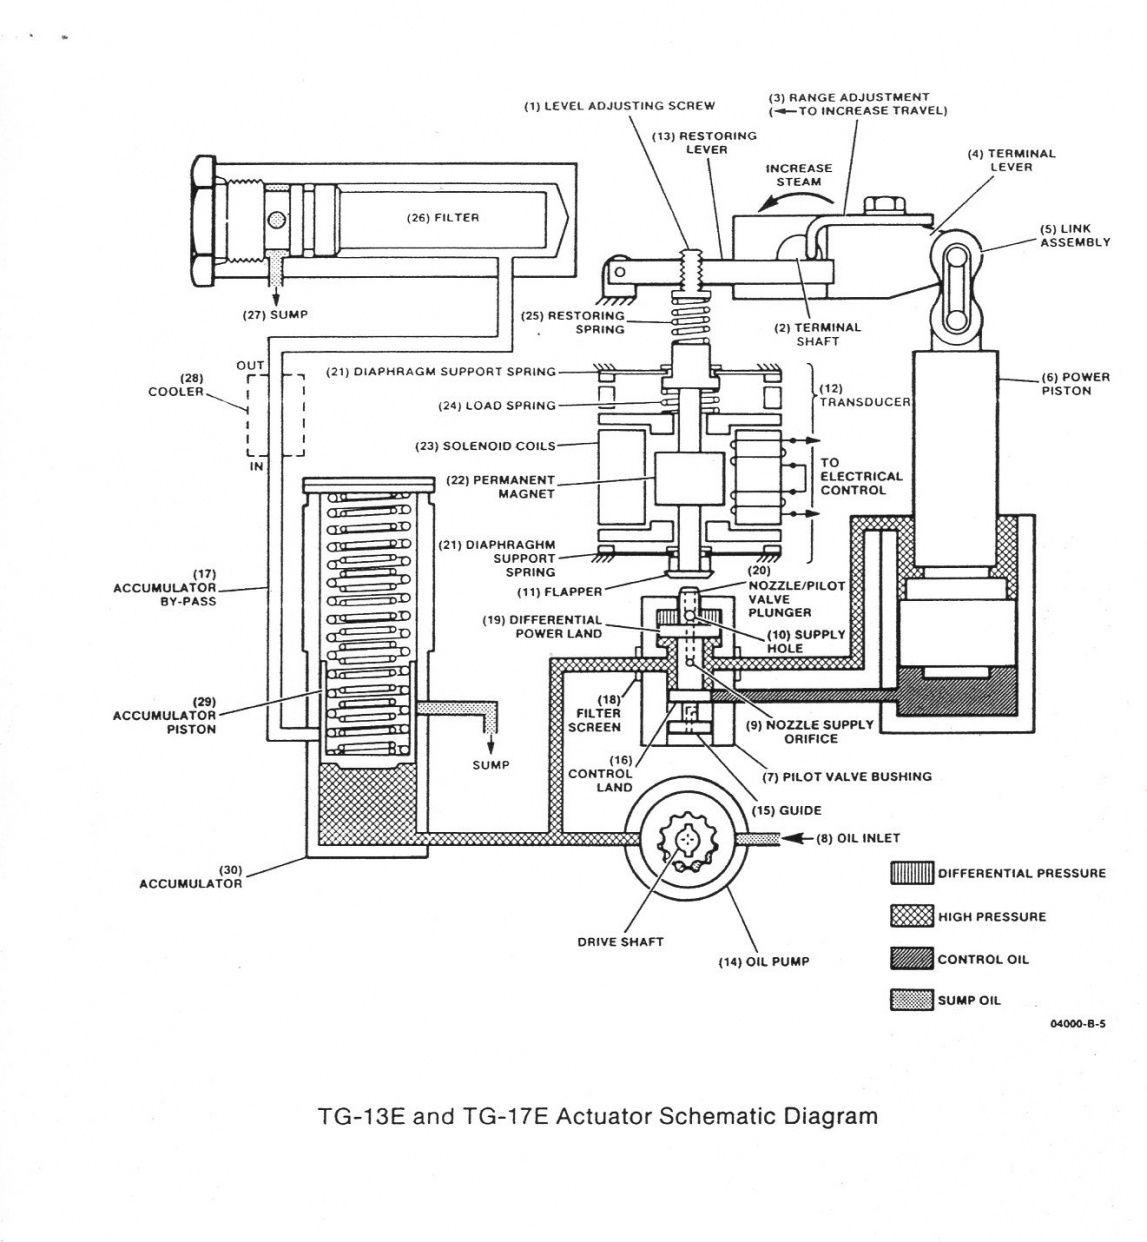 Woodward Type Tg 13 Control Schematic Diagram